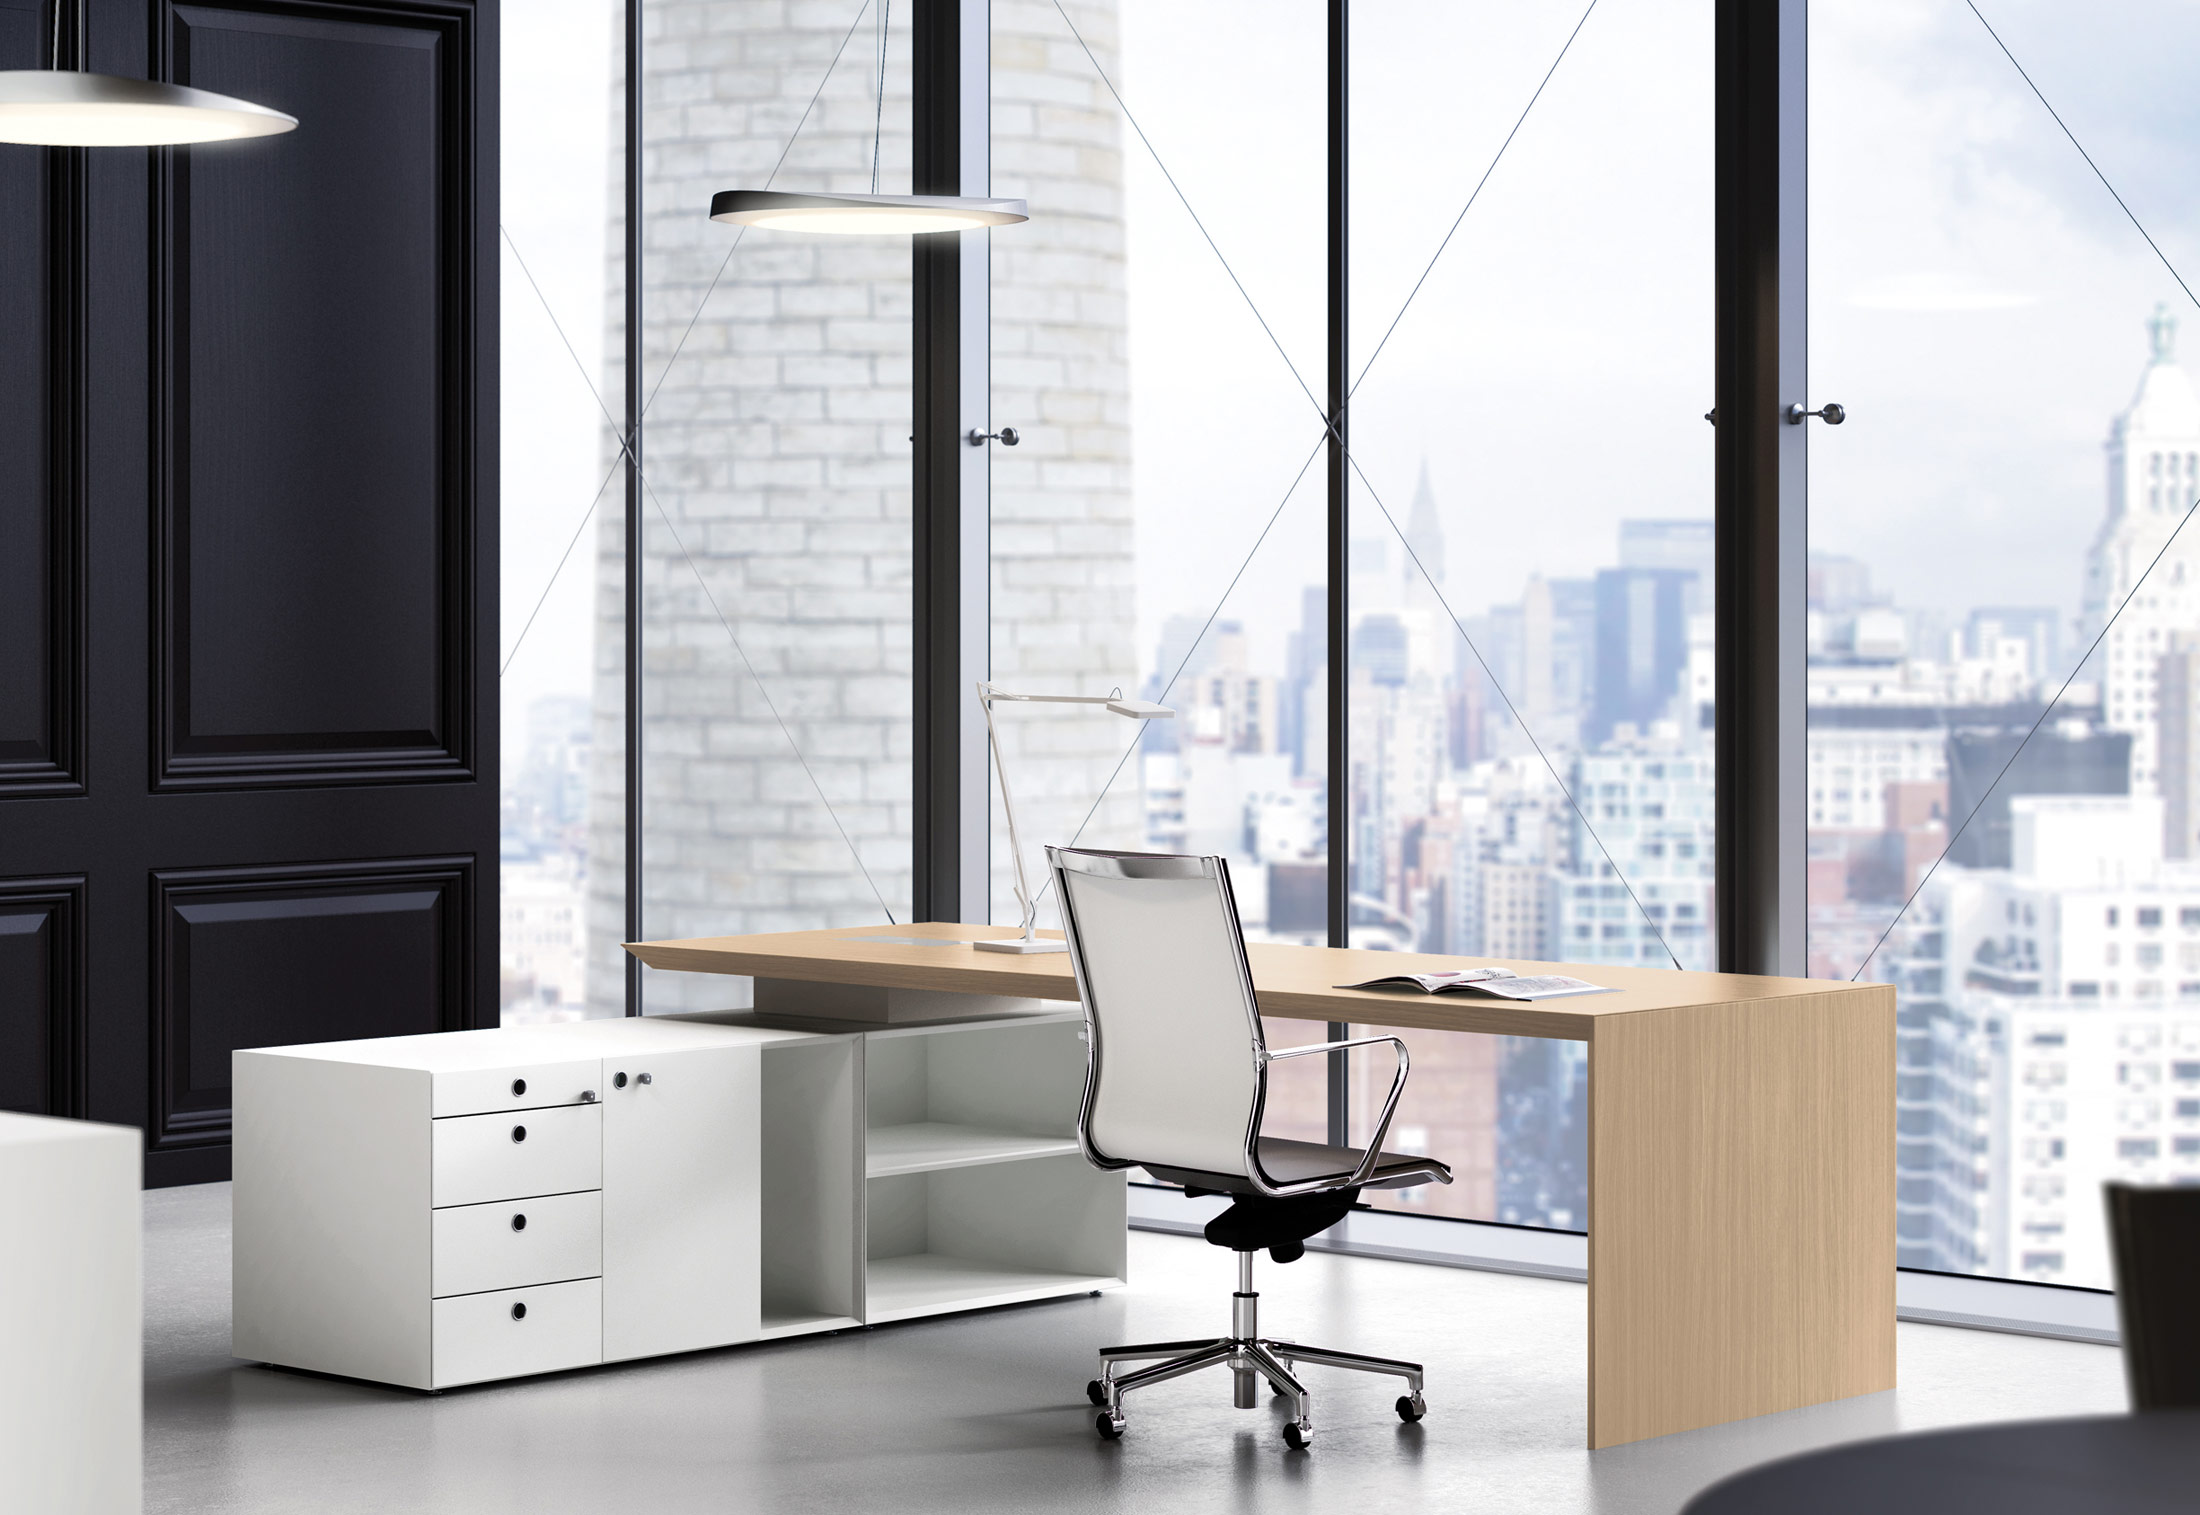 Multipliceo Working Desk System By Fantoni Stylepark